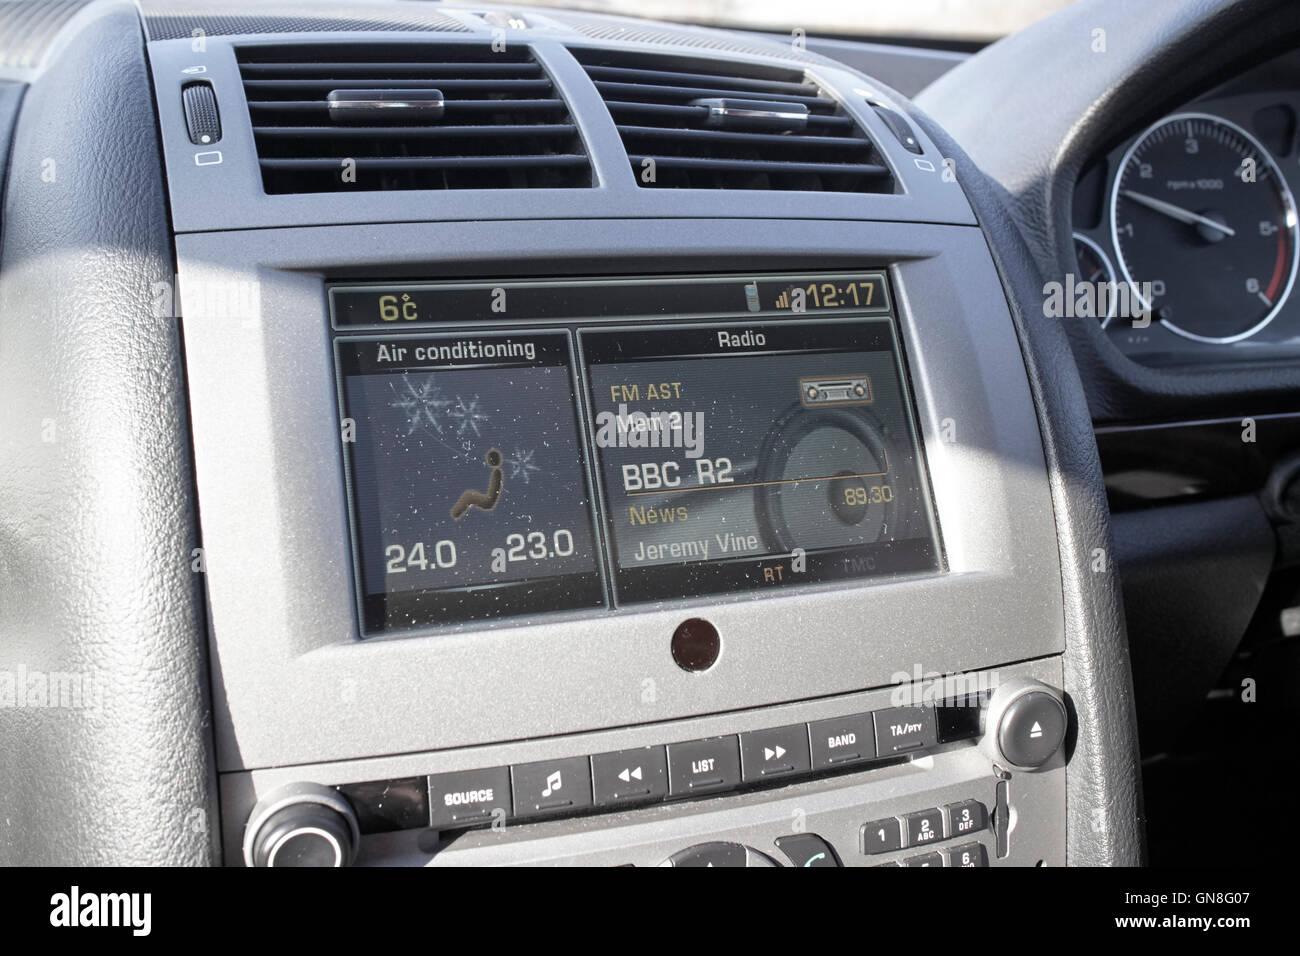 BBC Radio 2 displaying on car in screen enterainment display - Stock Image